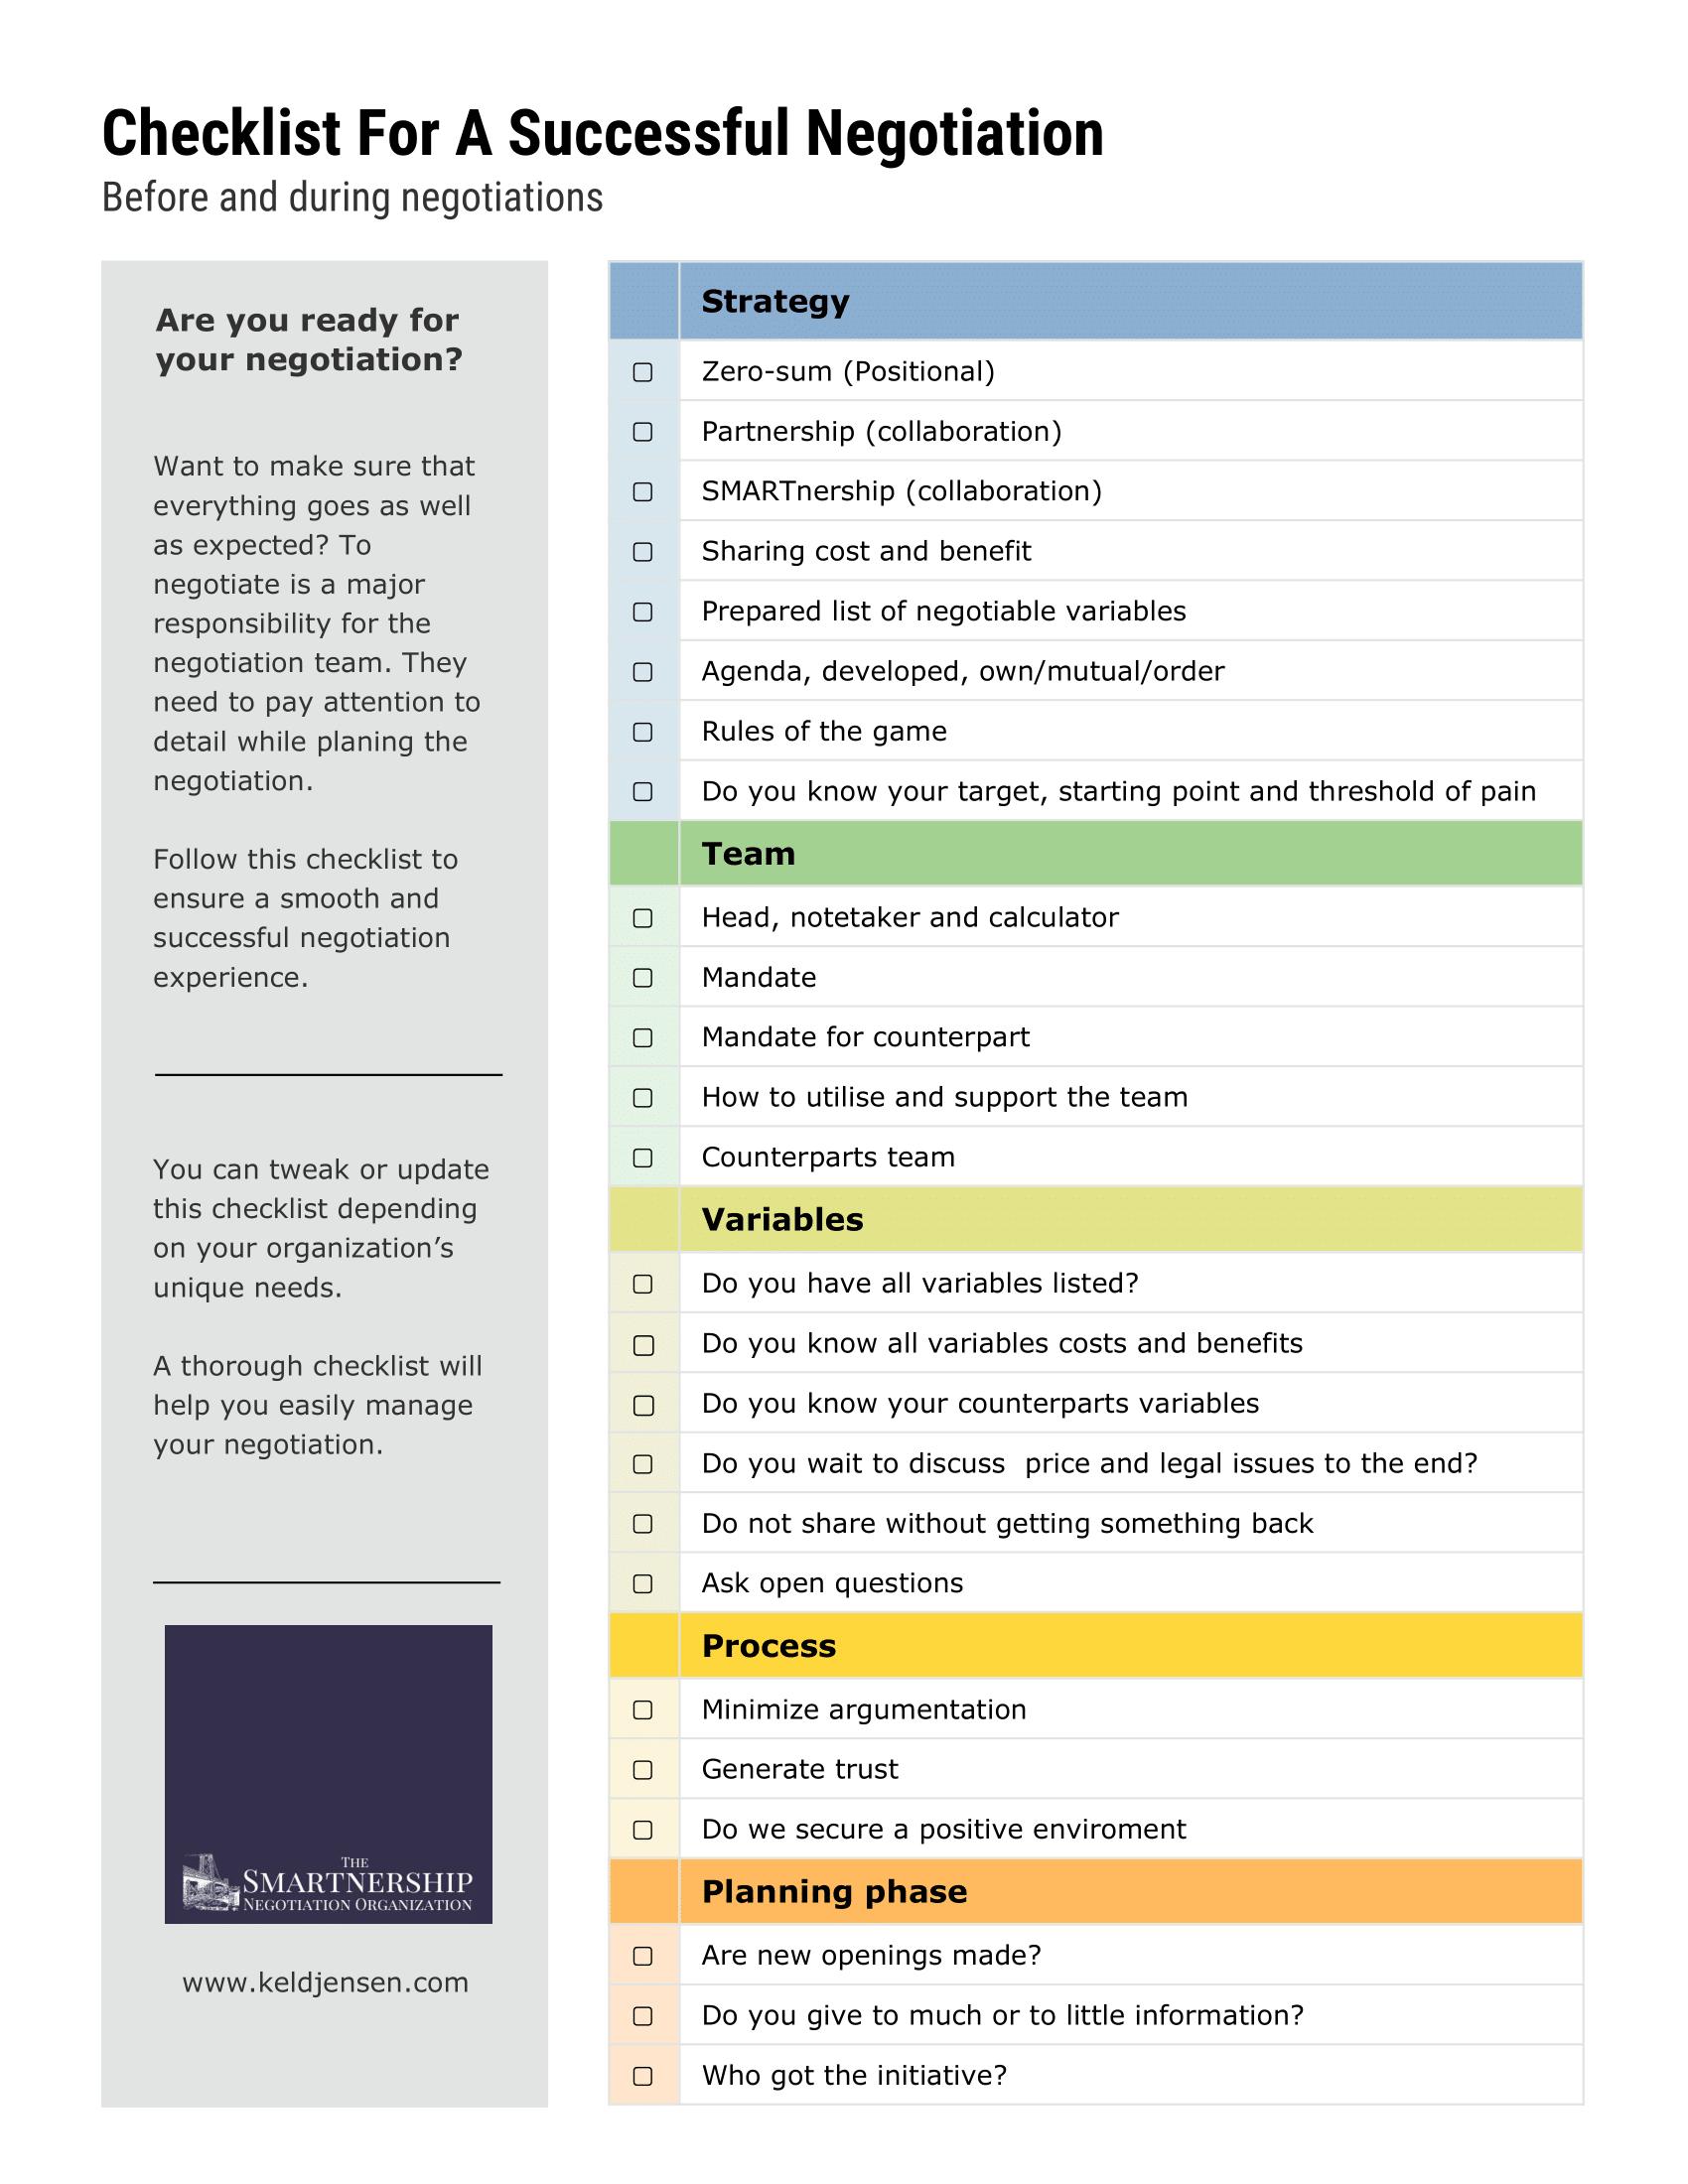 Checklist for Successful Negotiation